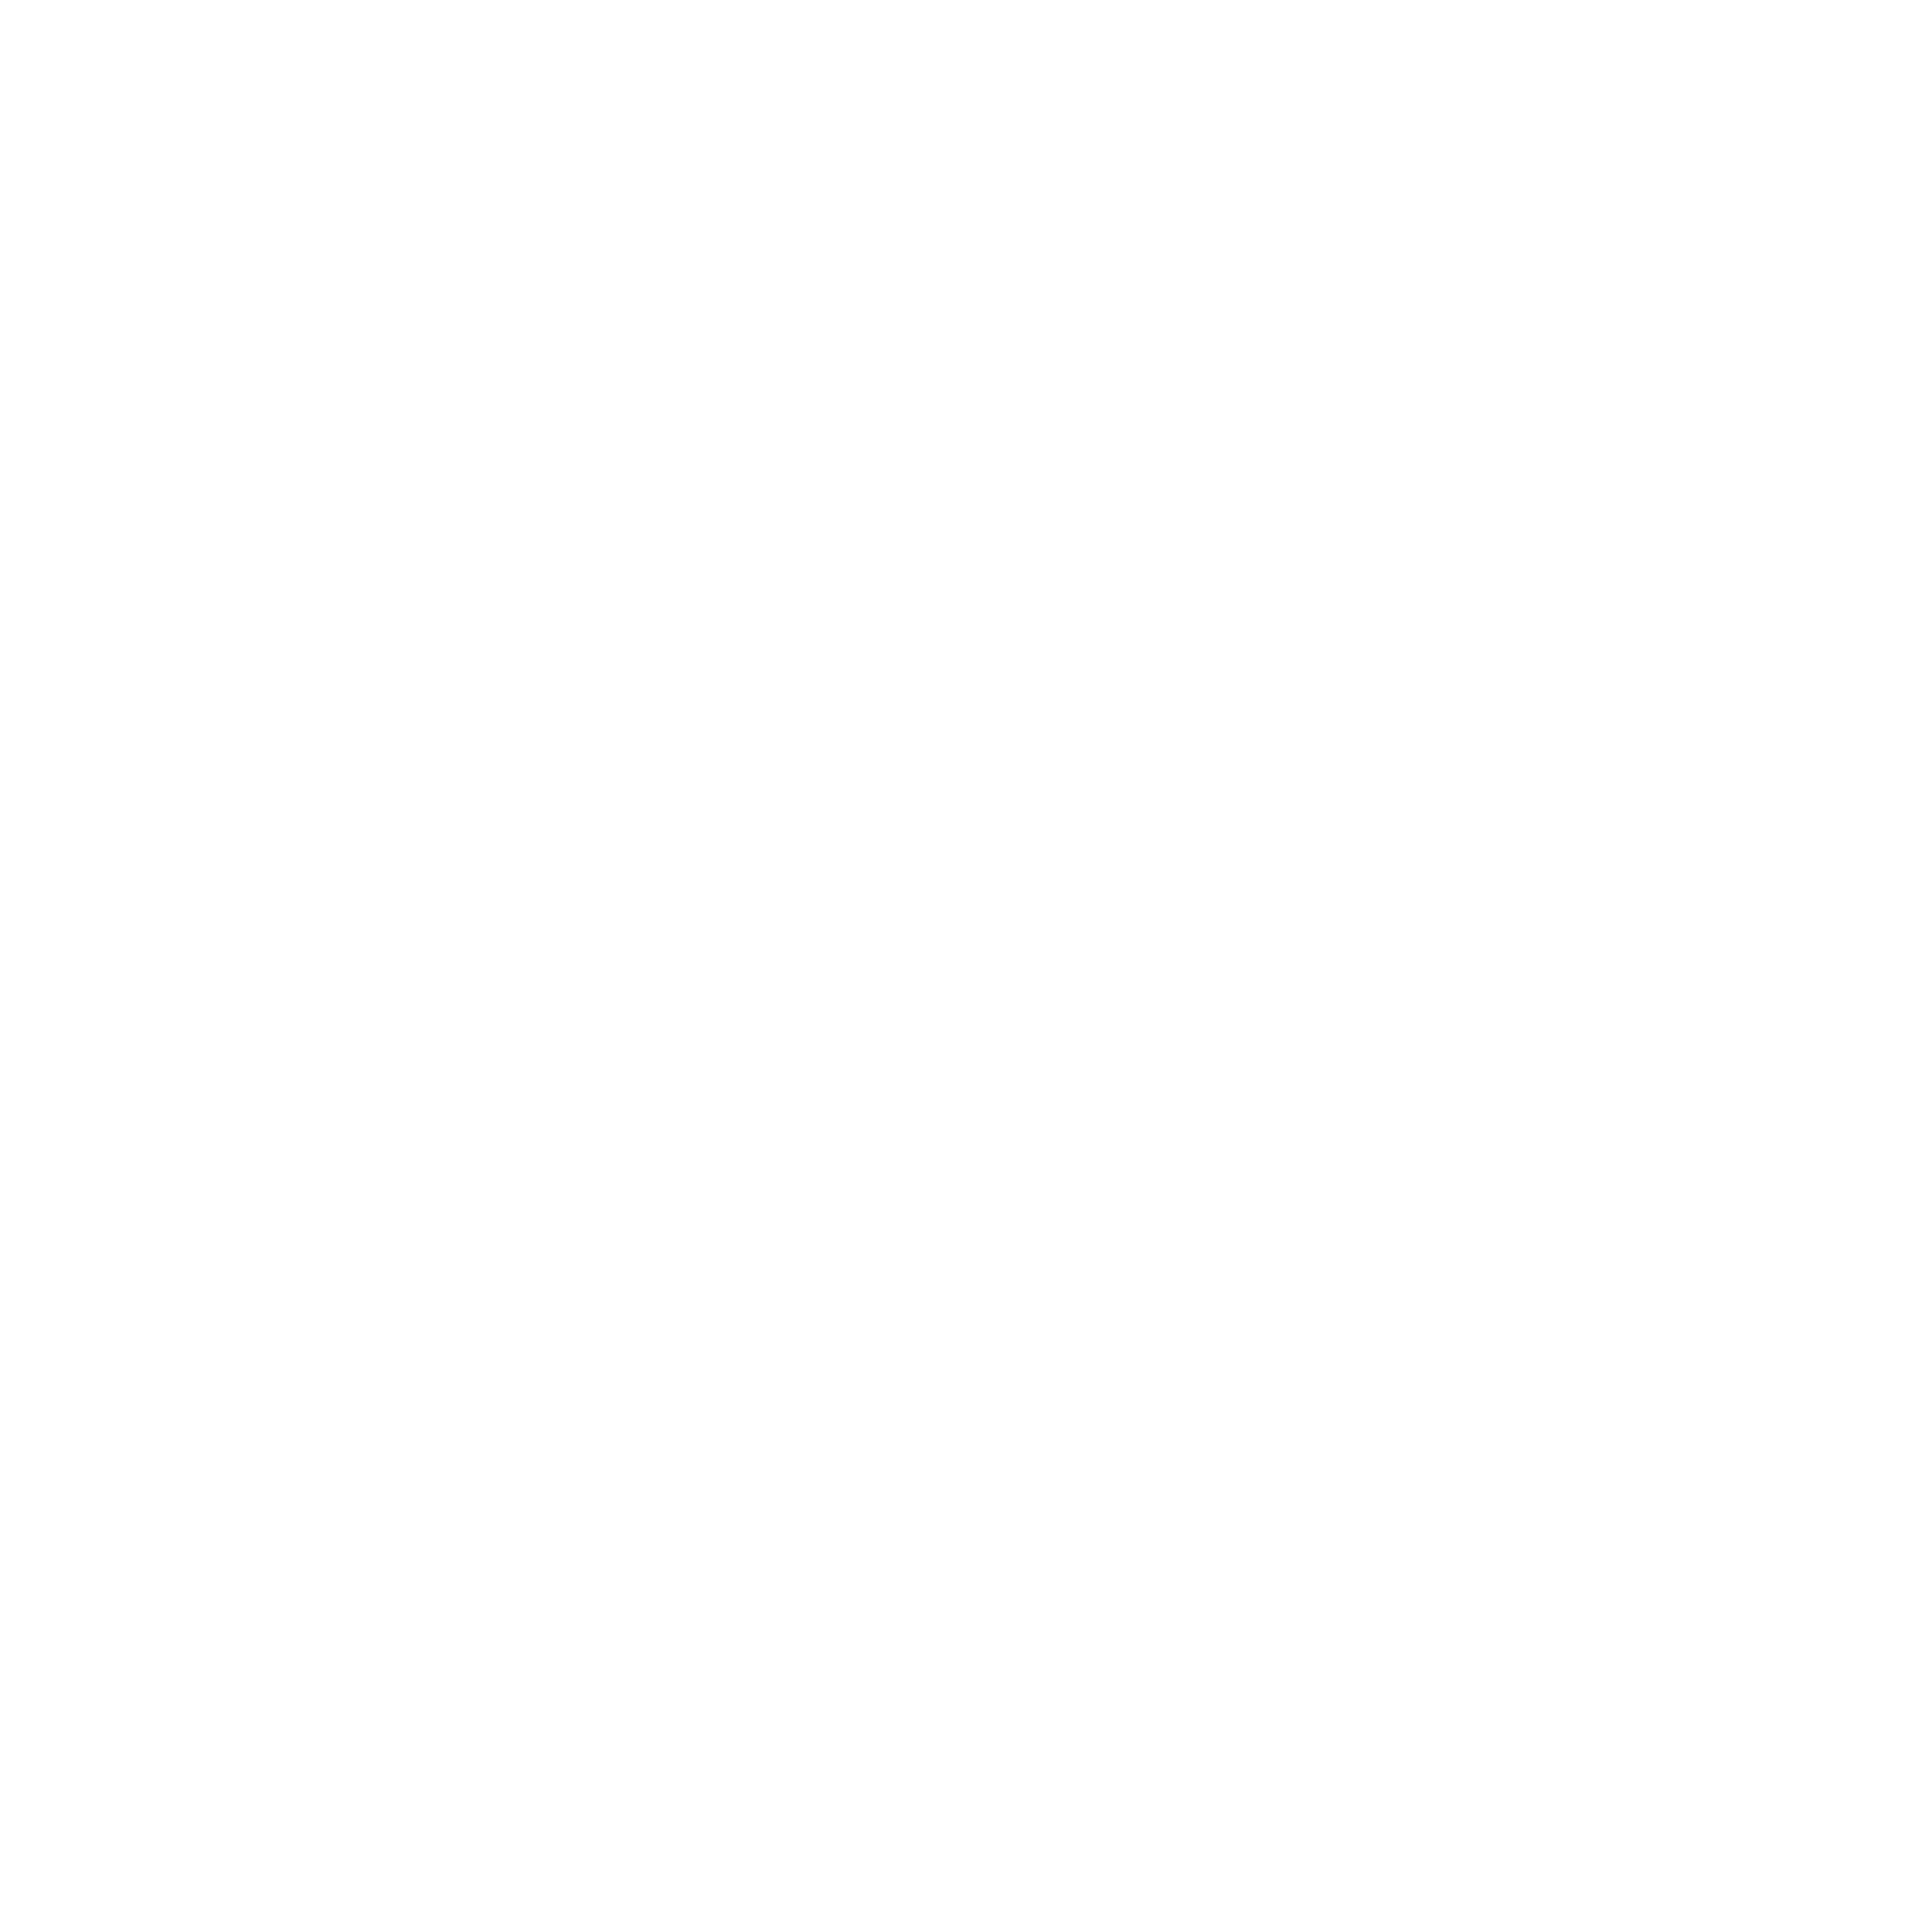 Icon Niedriger TOTOX-Wert